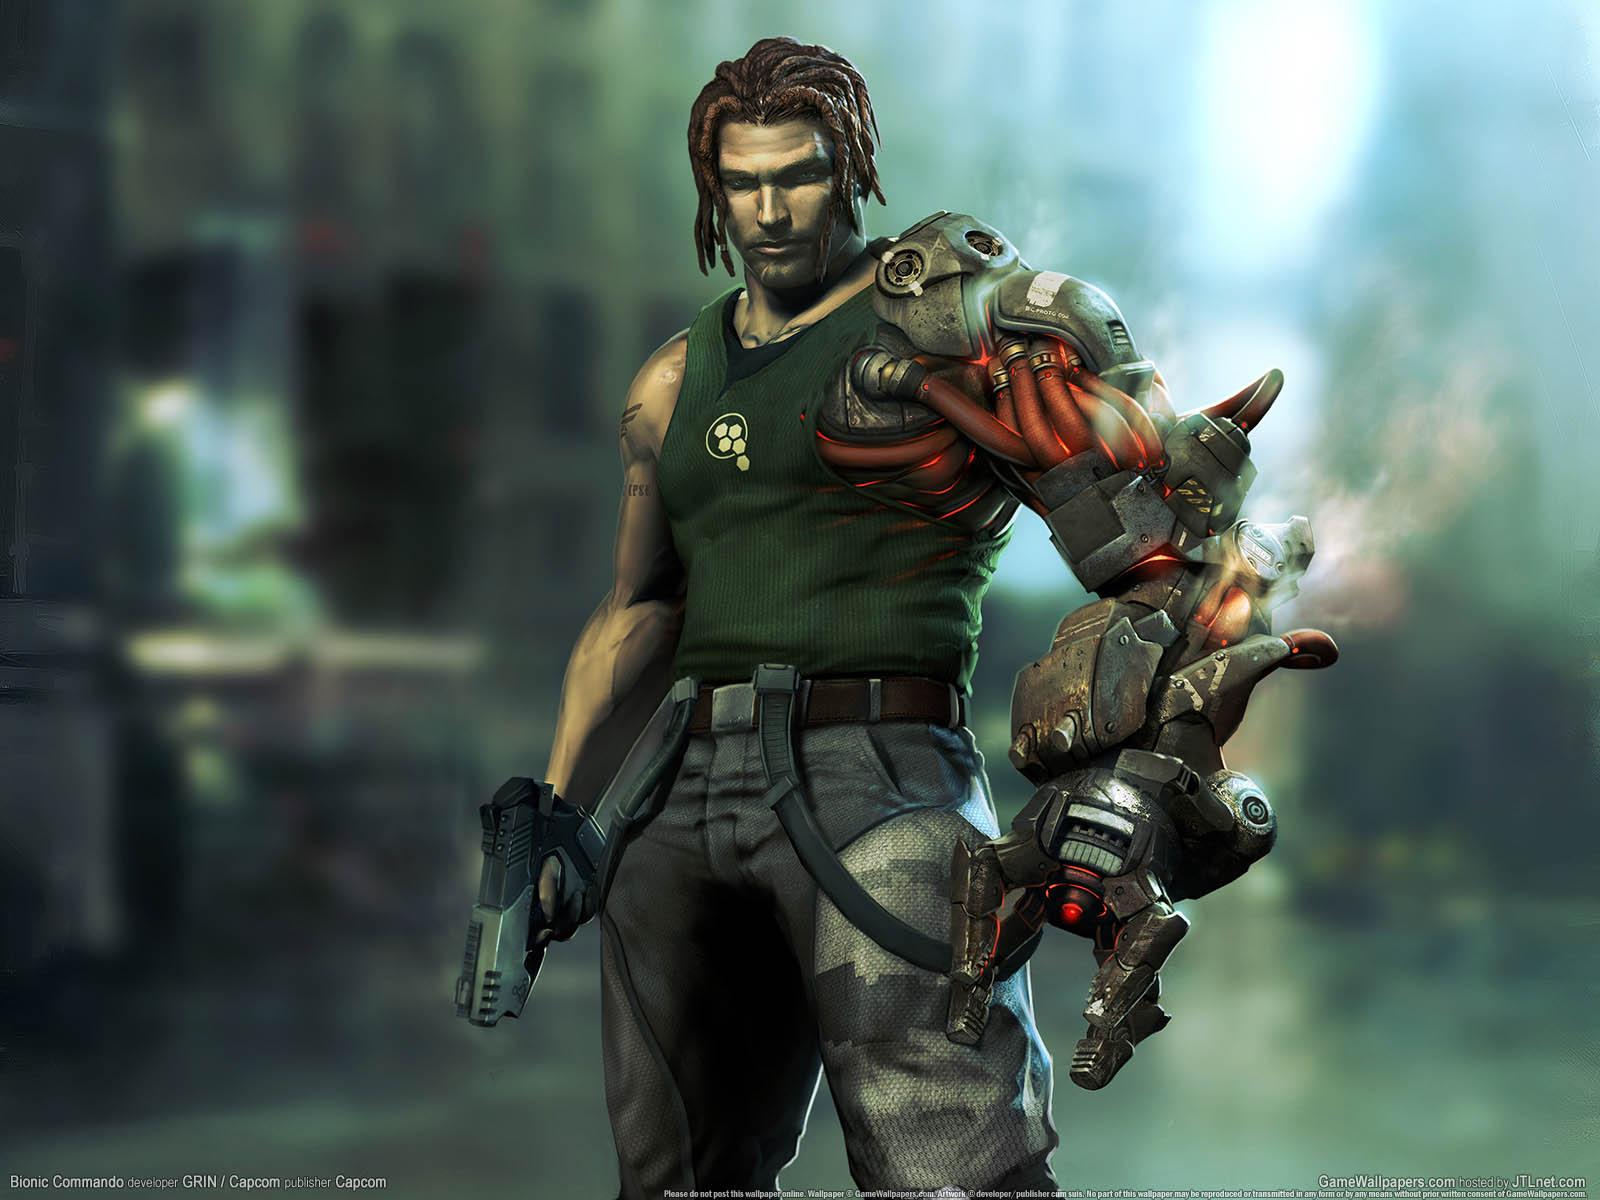 Bionic Commandoνmmer=05 achtergrond  1600x1200